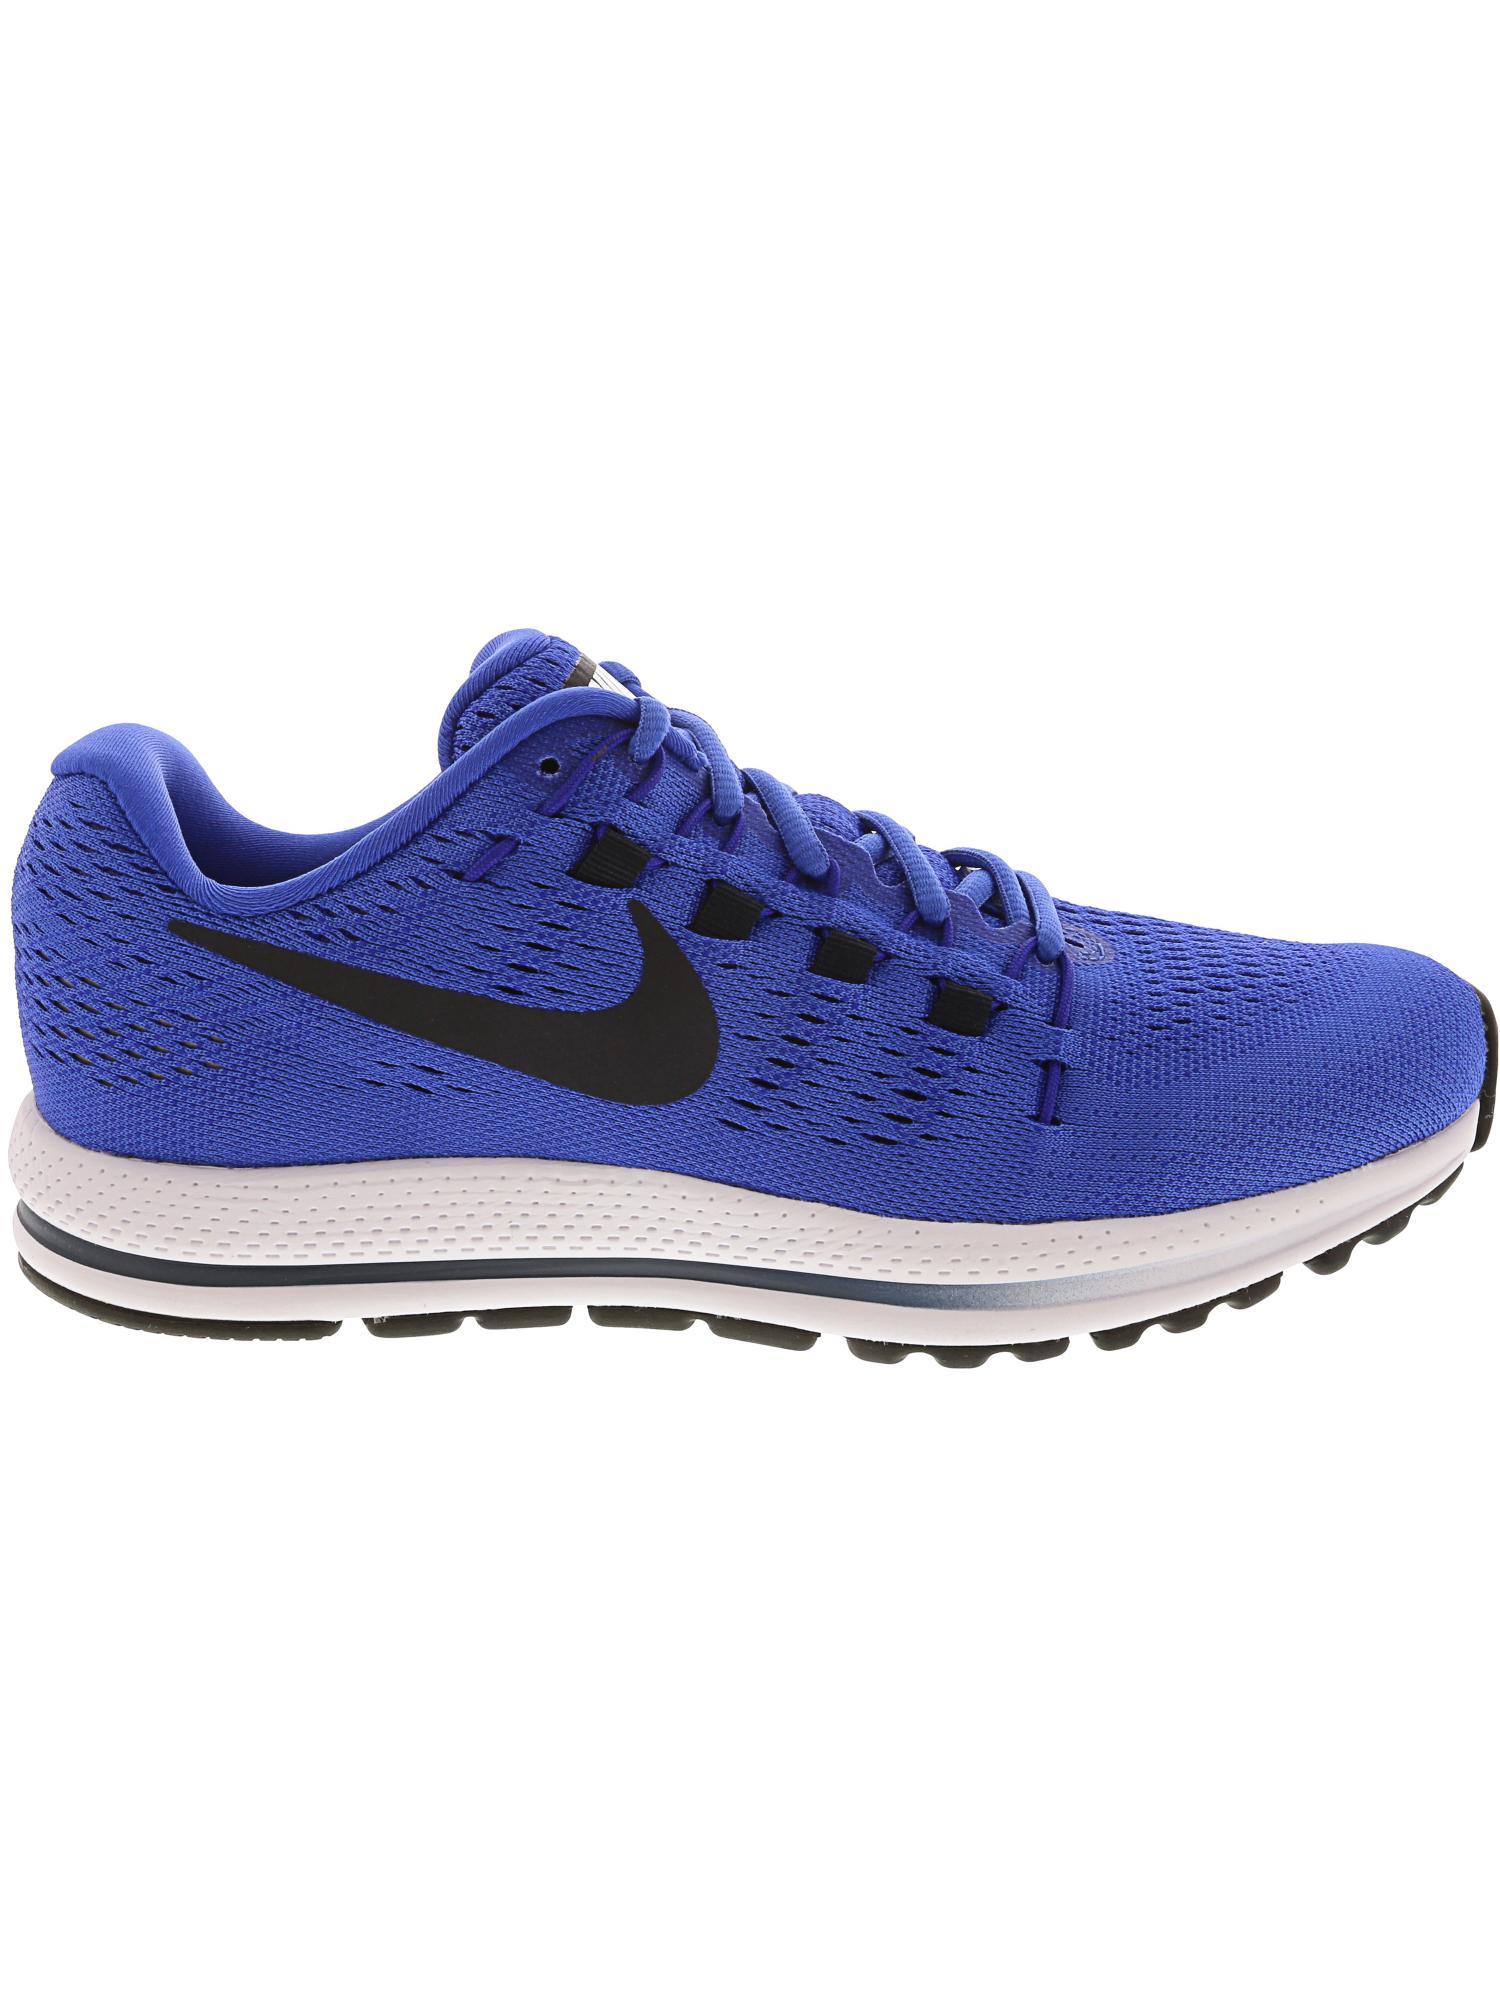 Nike Mens Air Zoom Vomero 13 Running Shoes - amazon.com